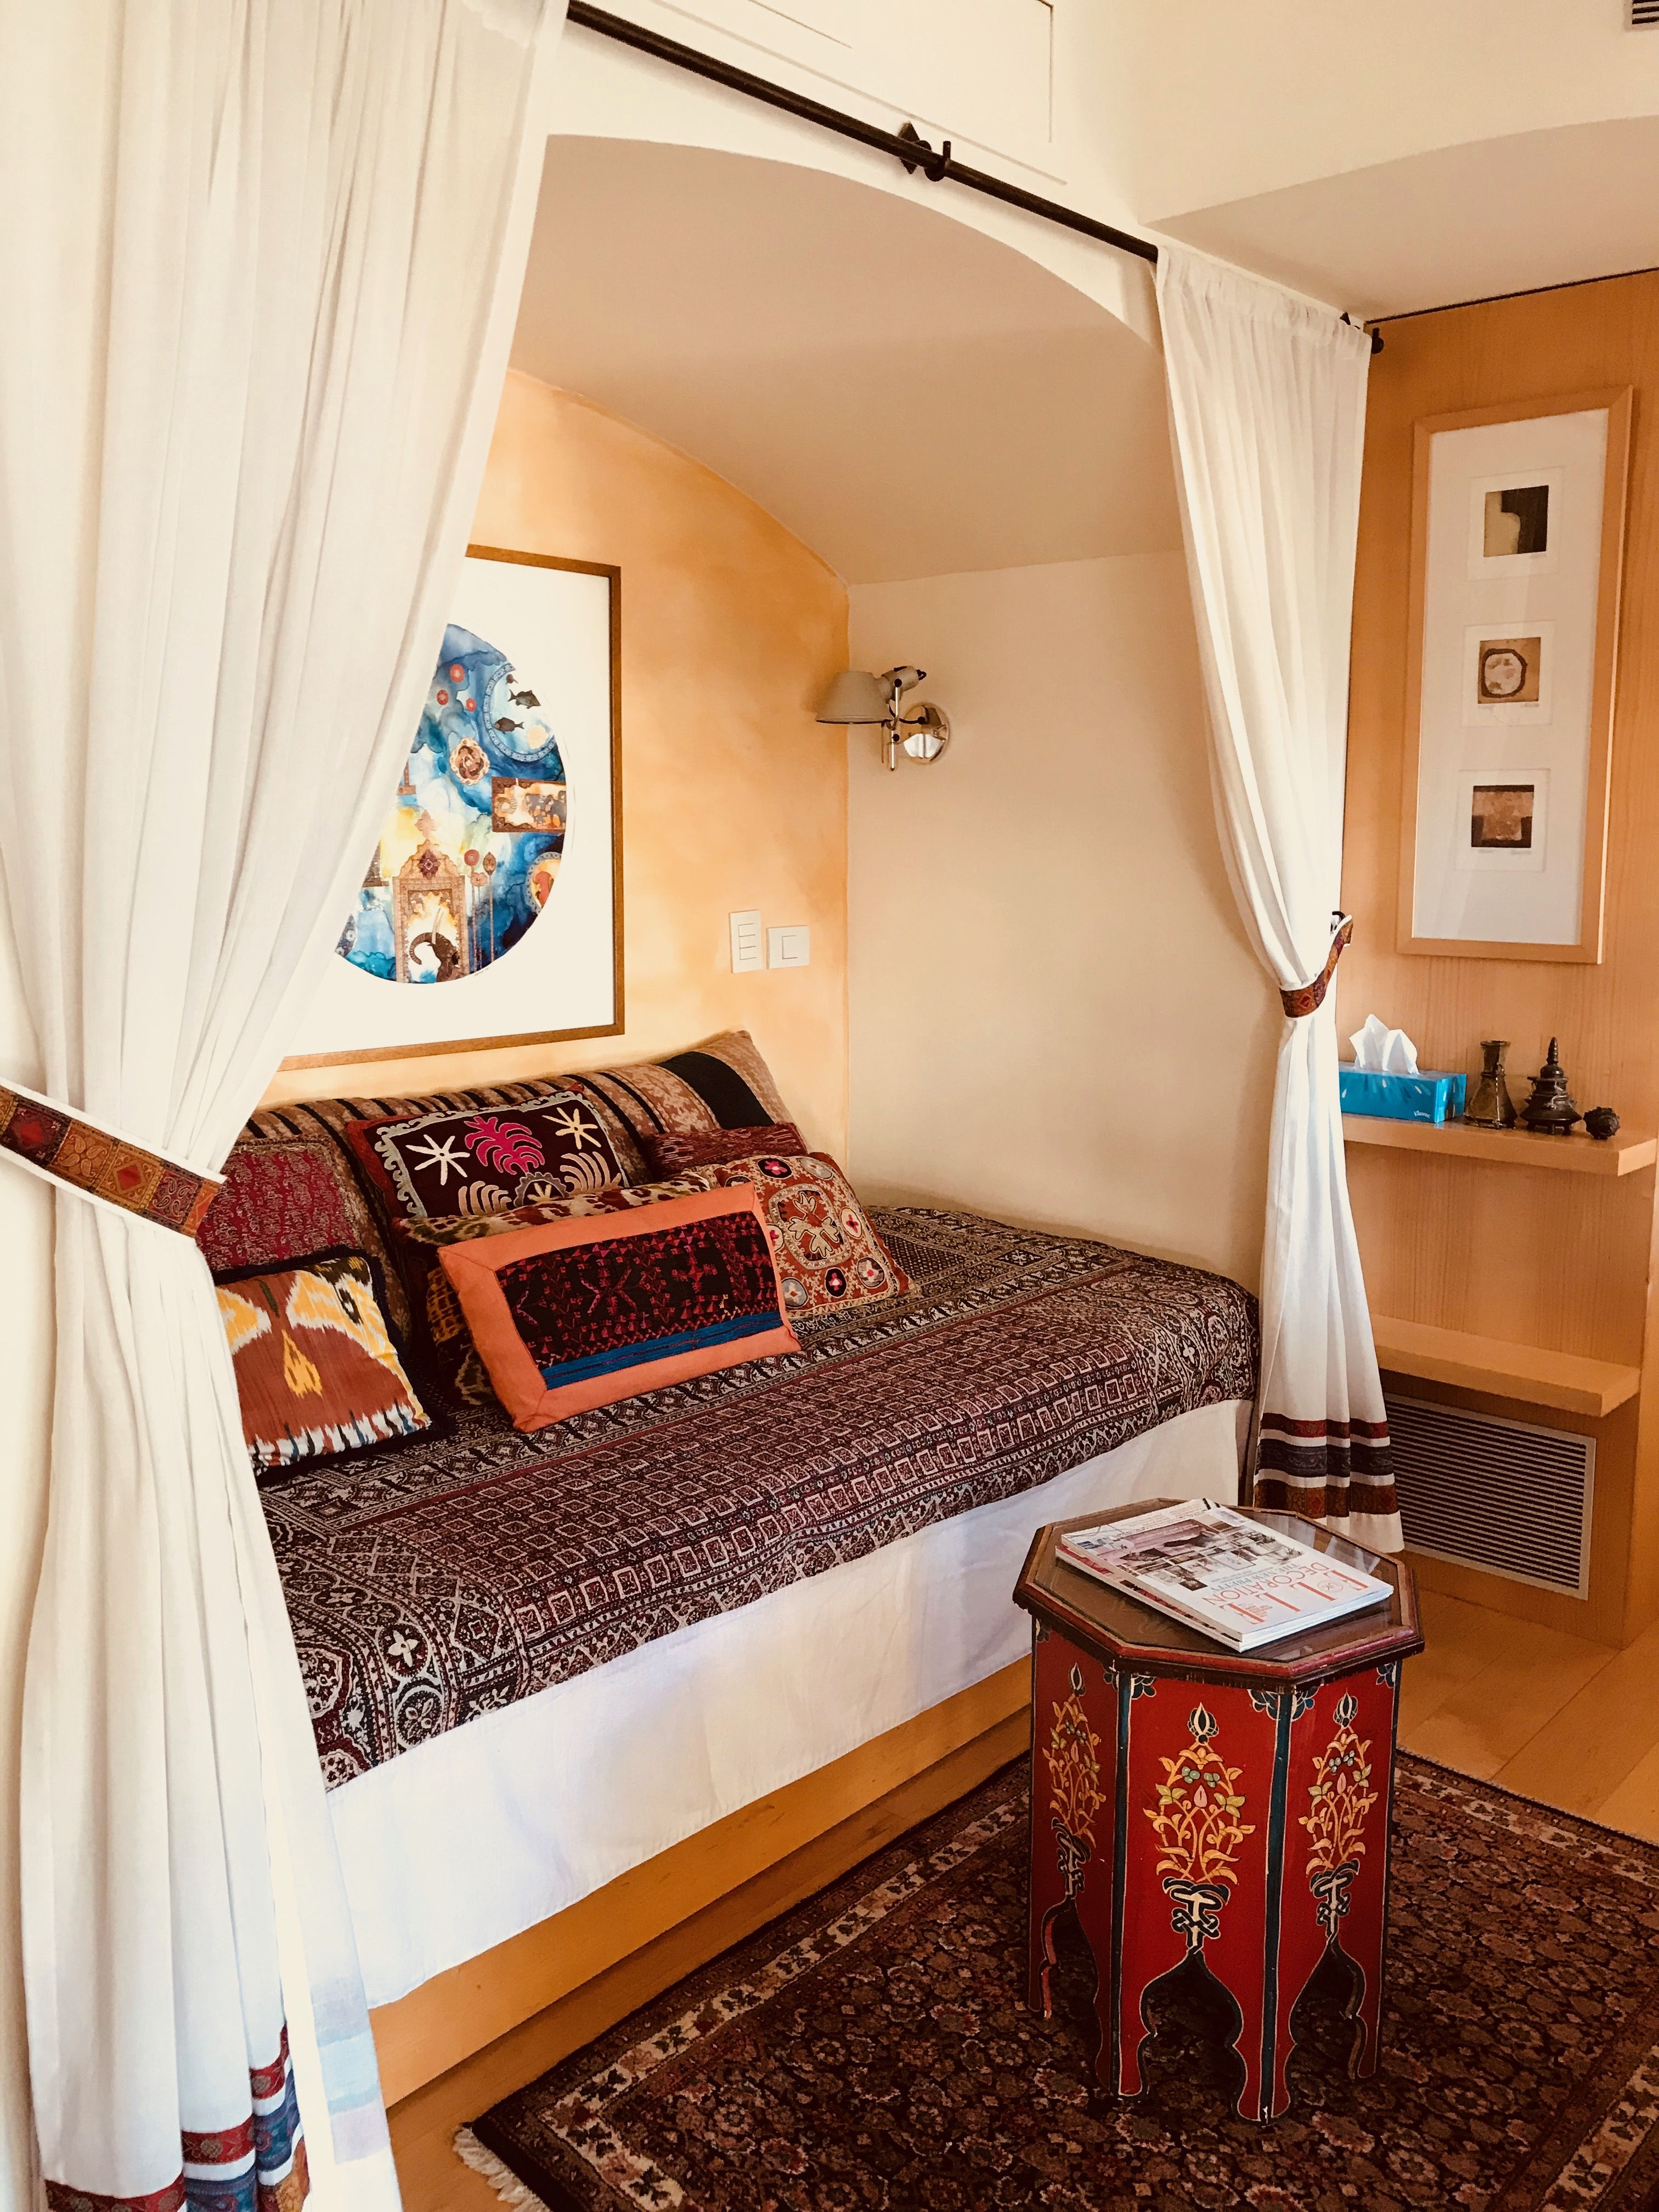 my home in Jerusalem  Home, Home decor, Furniture